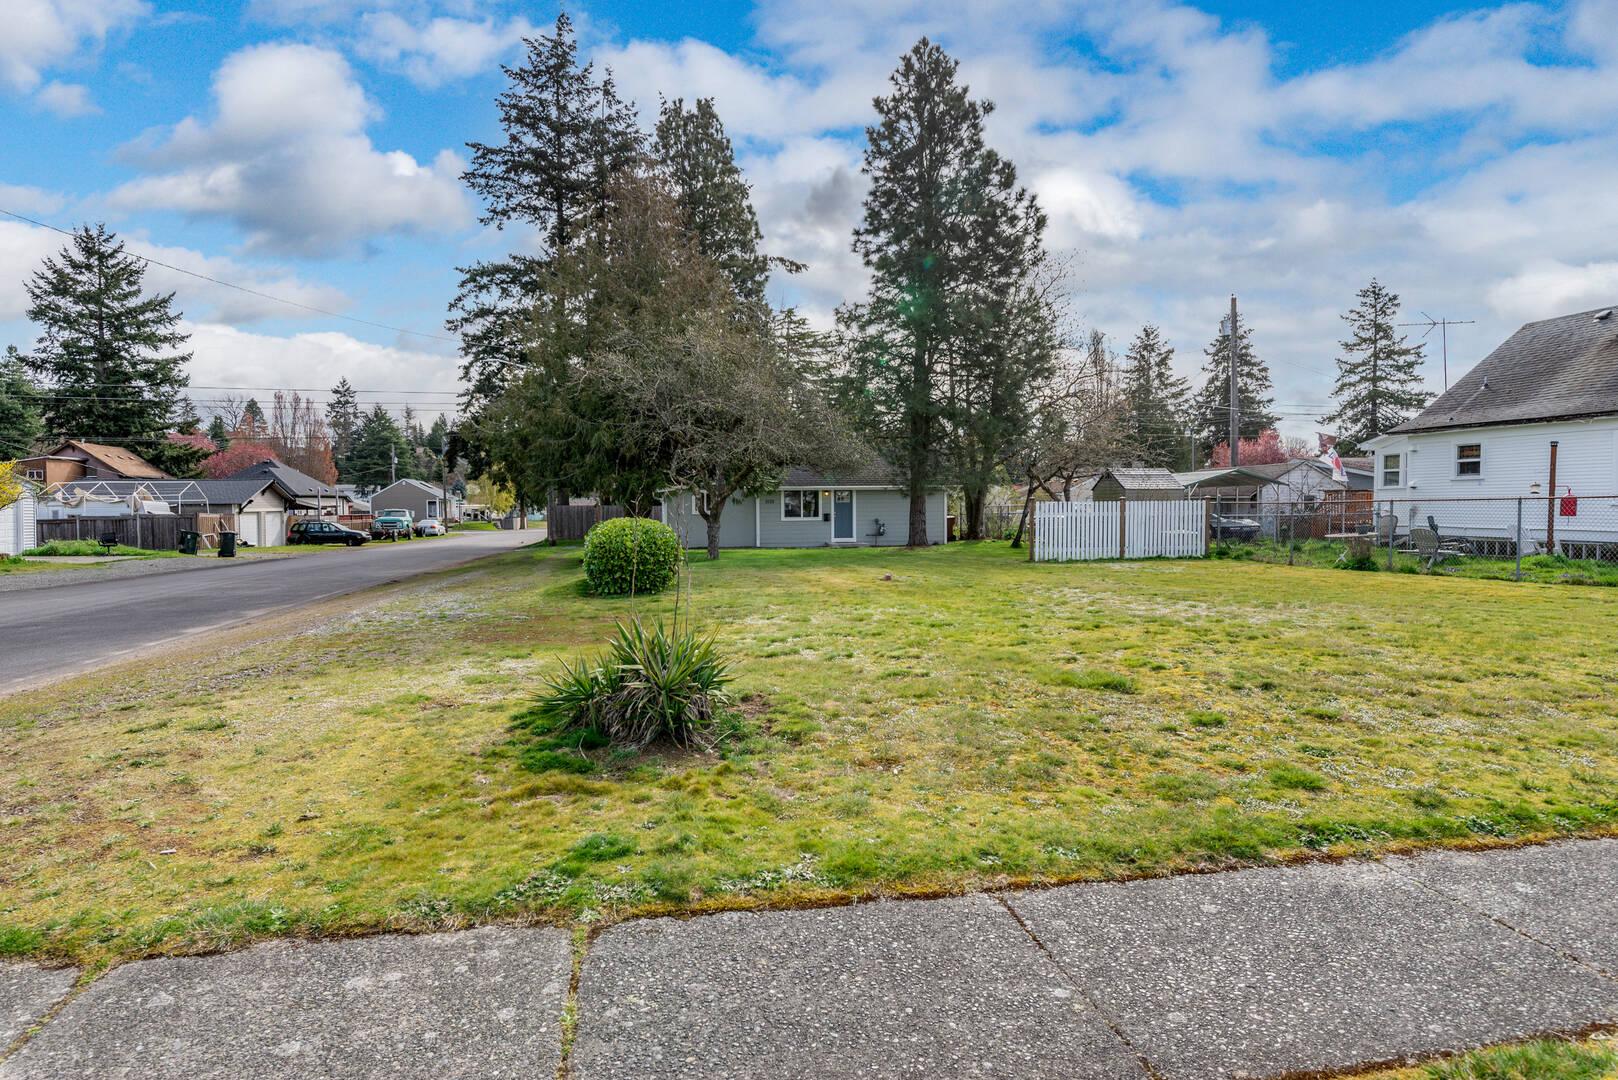 5103 S Fife St Tacoma, WA 98409